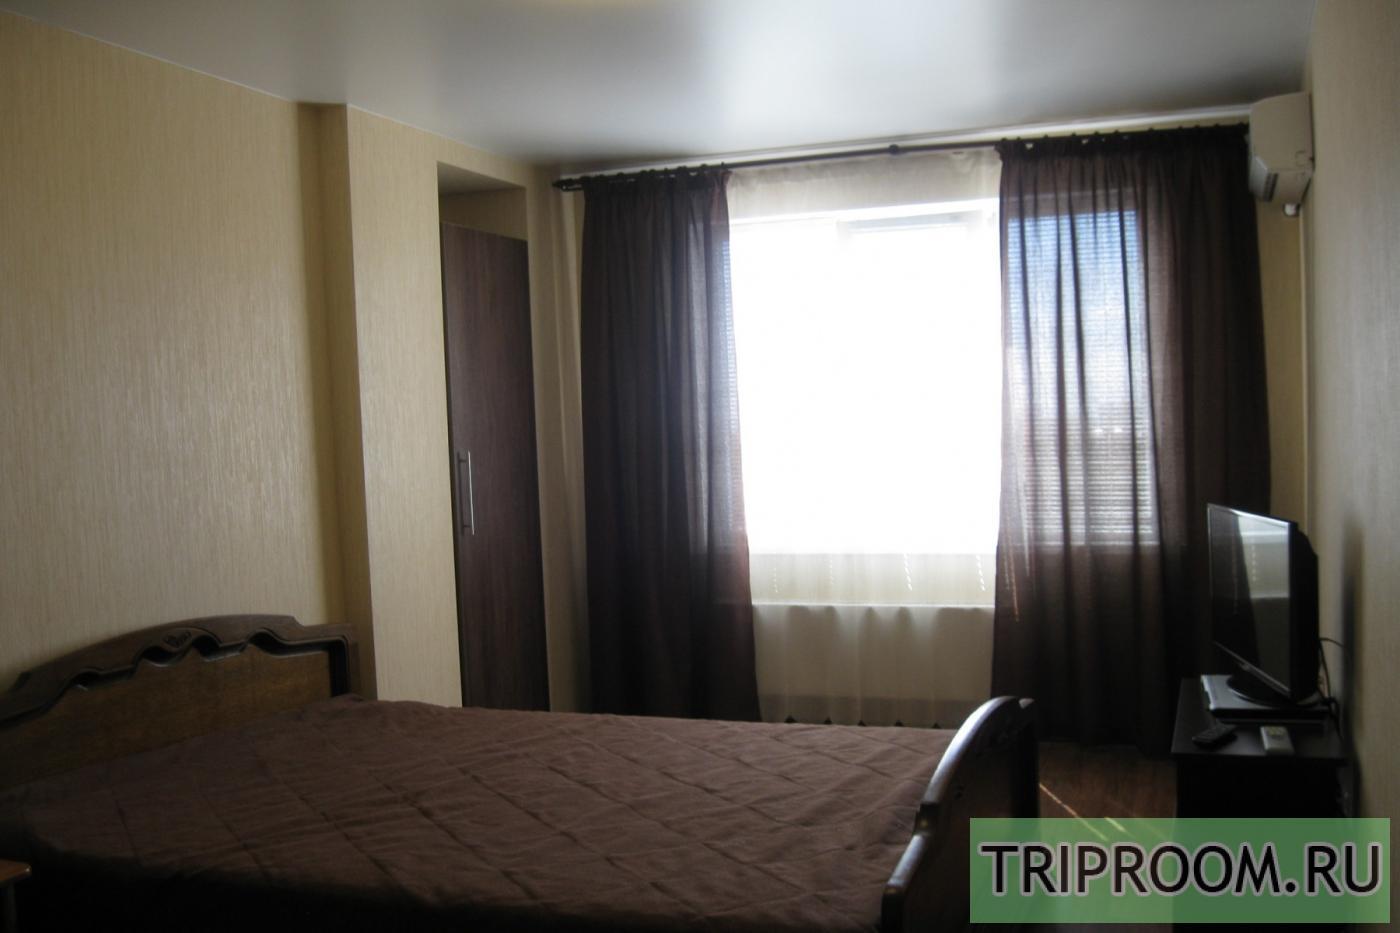 1-комнатная квартира посуточно (вариант № 22849), ул. Шишкова улица, фото № 1